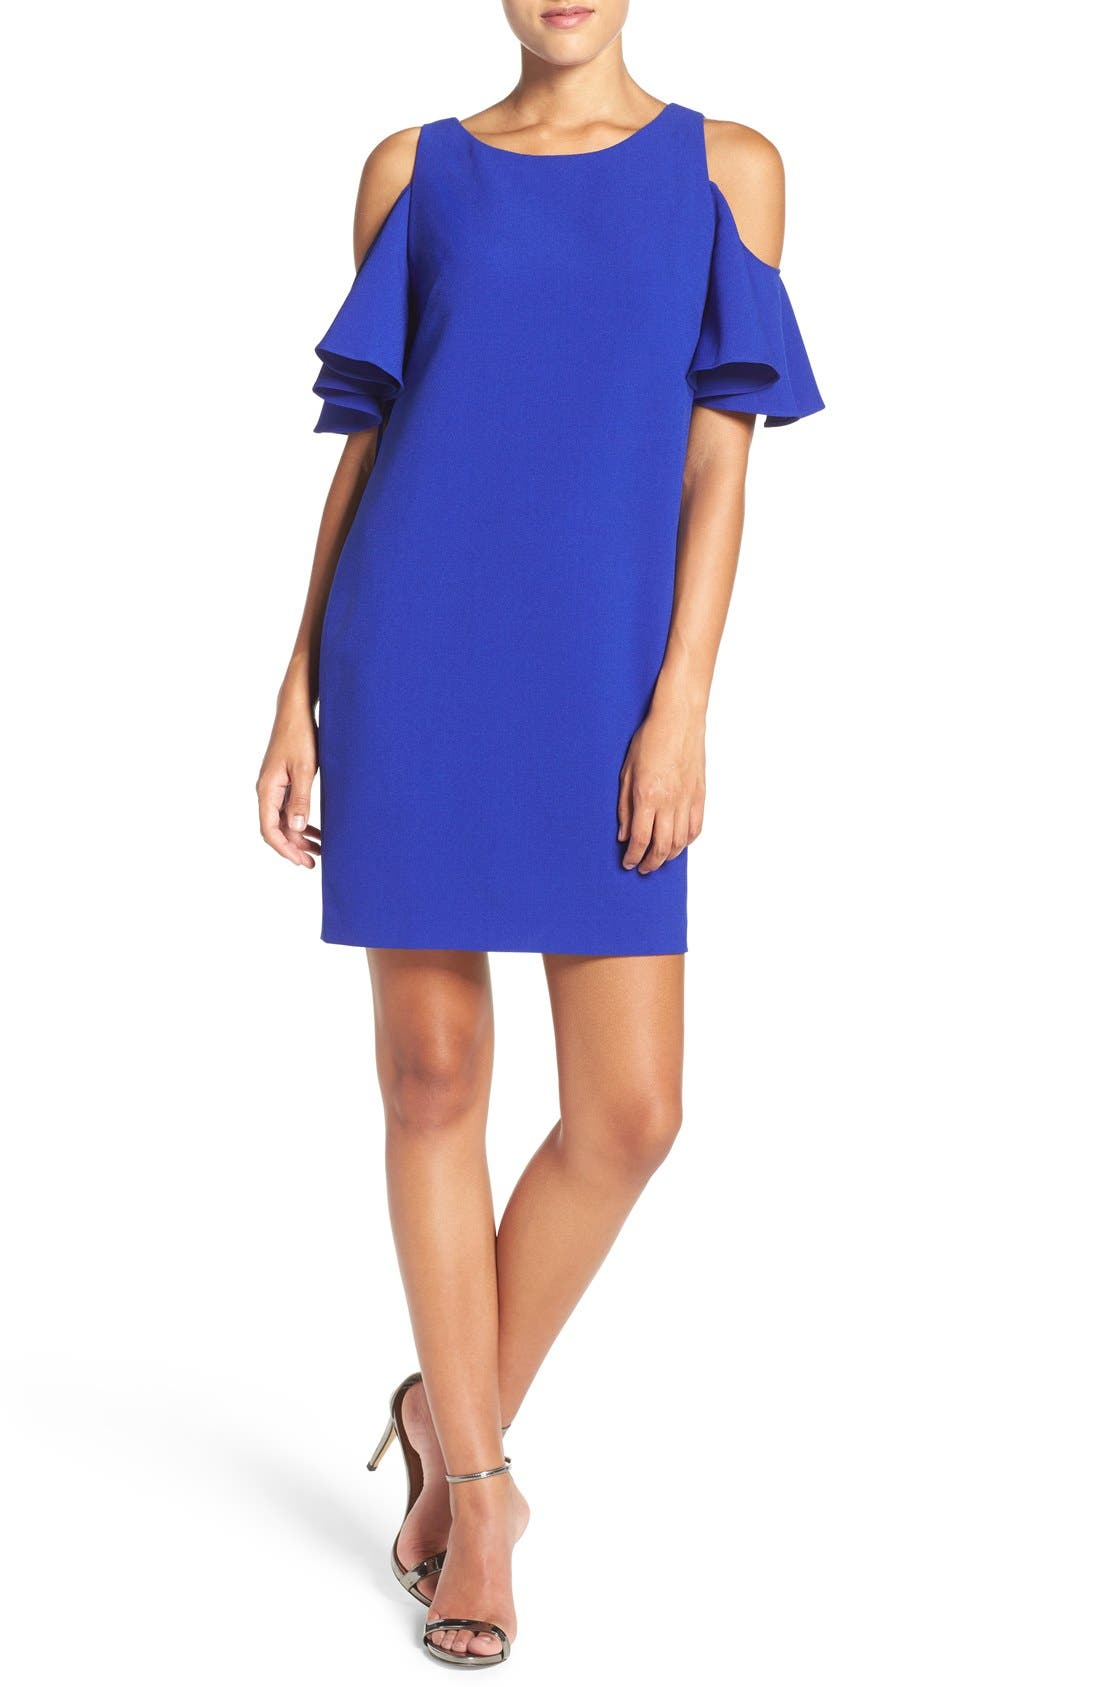 Chelsea28 'Peek-A-Boo' Cold Shoulder Shift Dress